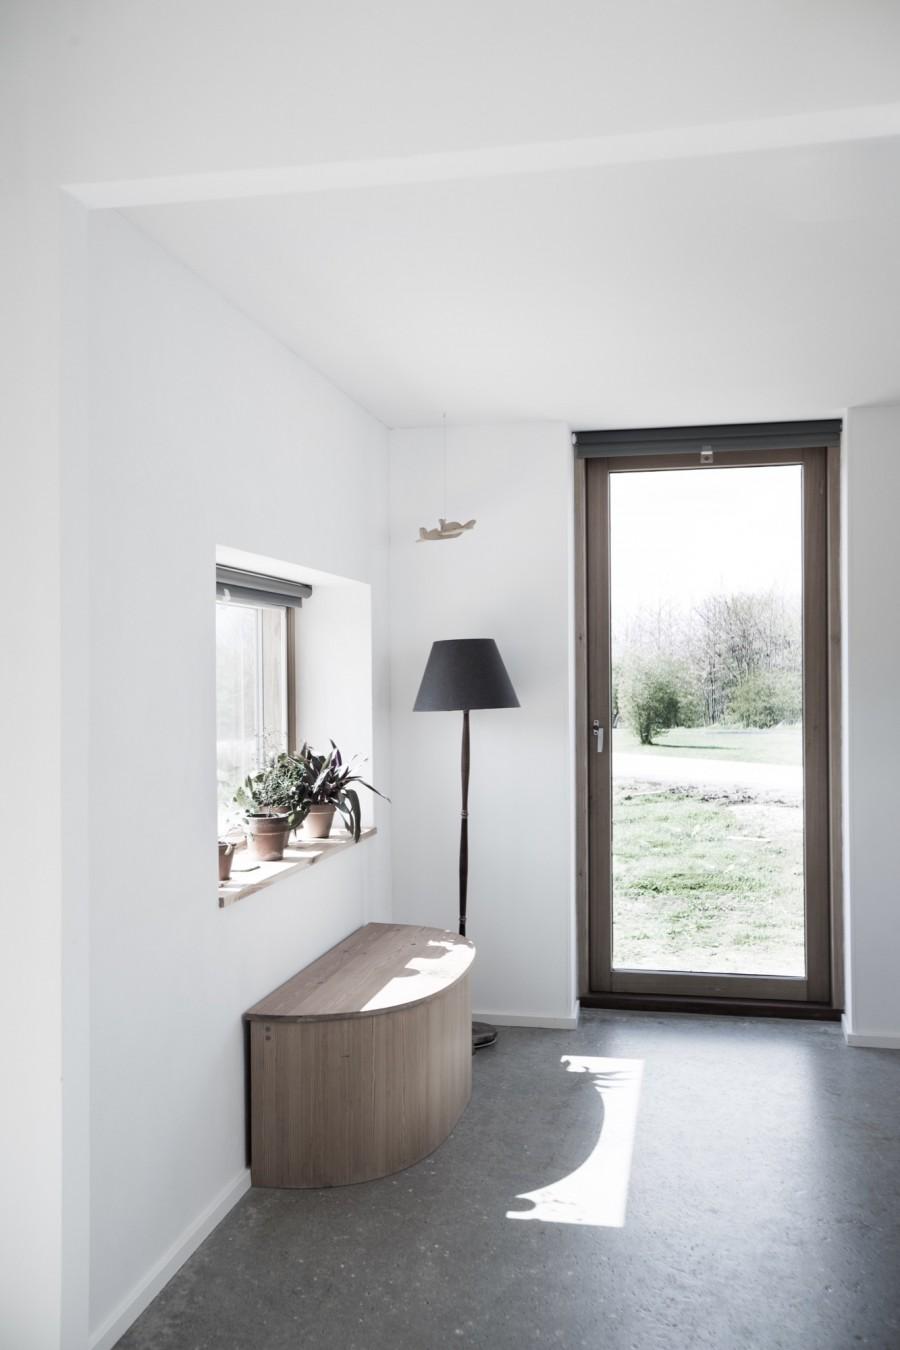 light-house-sigurd-larsen-aprilandmay